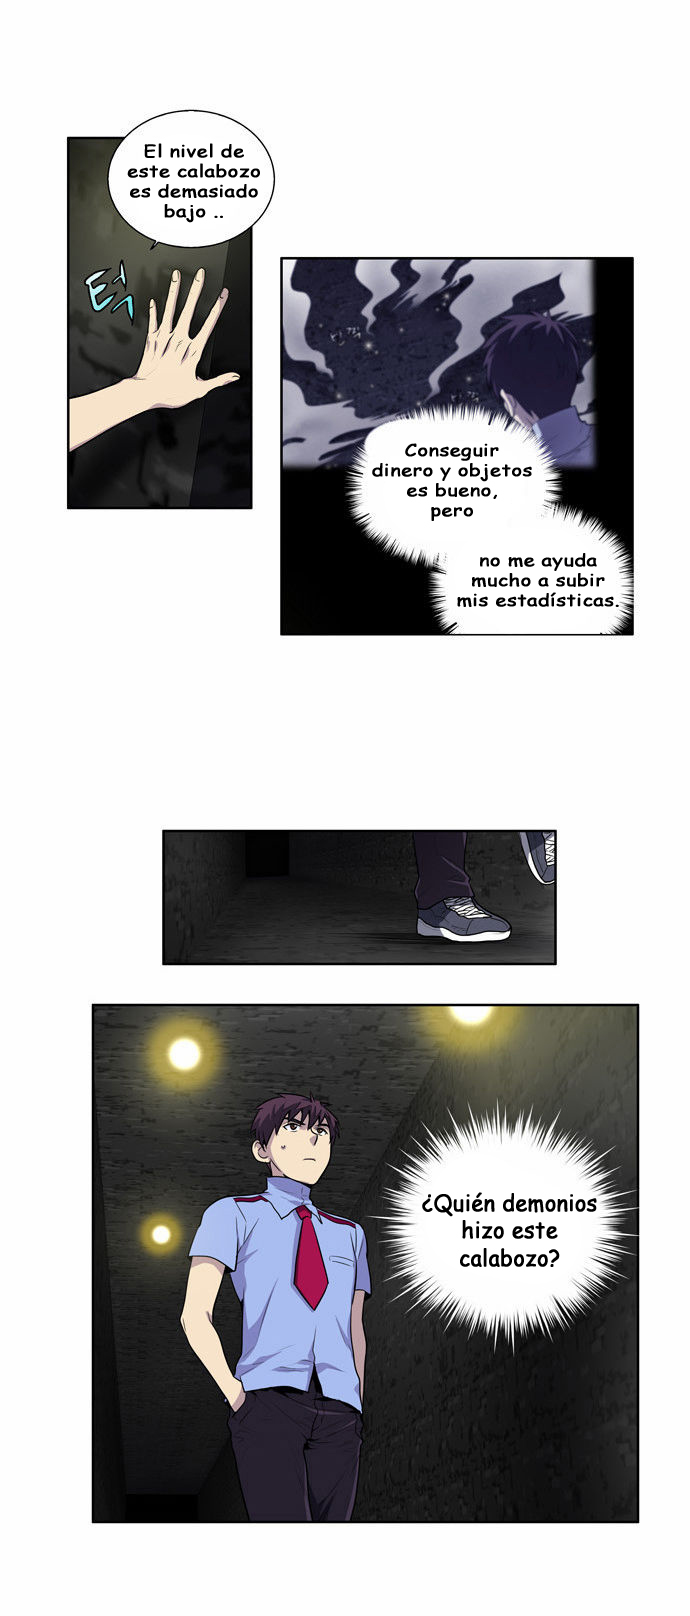 http://c5.ninemanga.com/es_manga/61/1725/396910/f72f05e91d583cf63ae47e955ca9c312.jpg Page 2